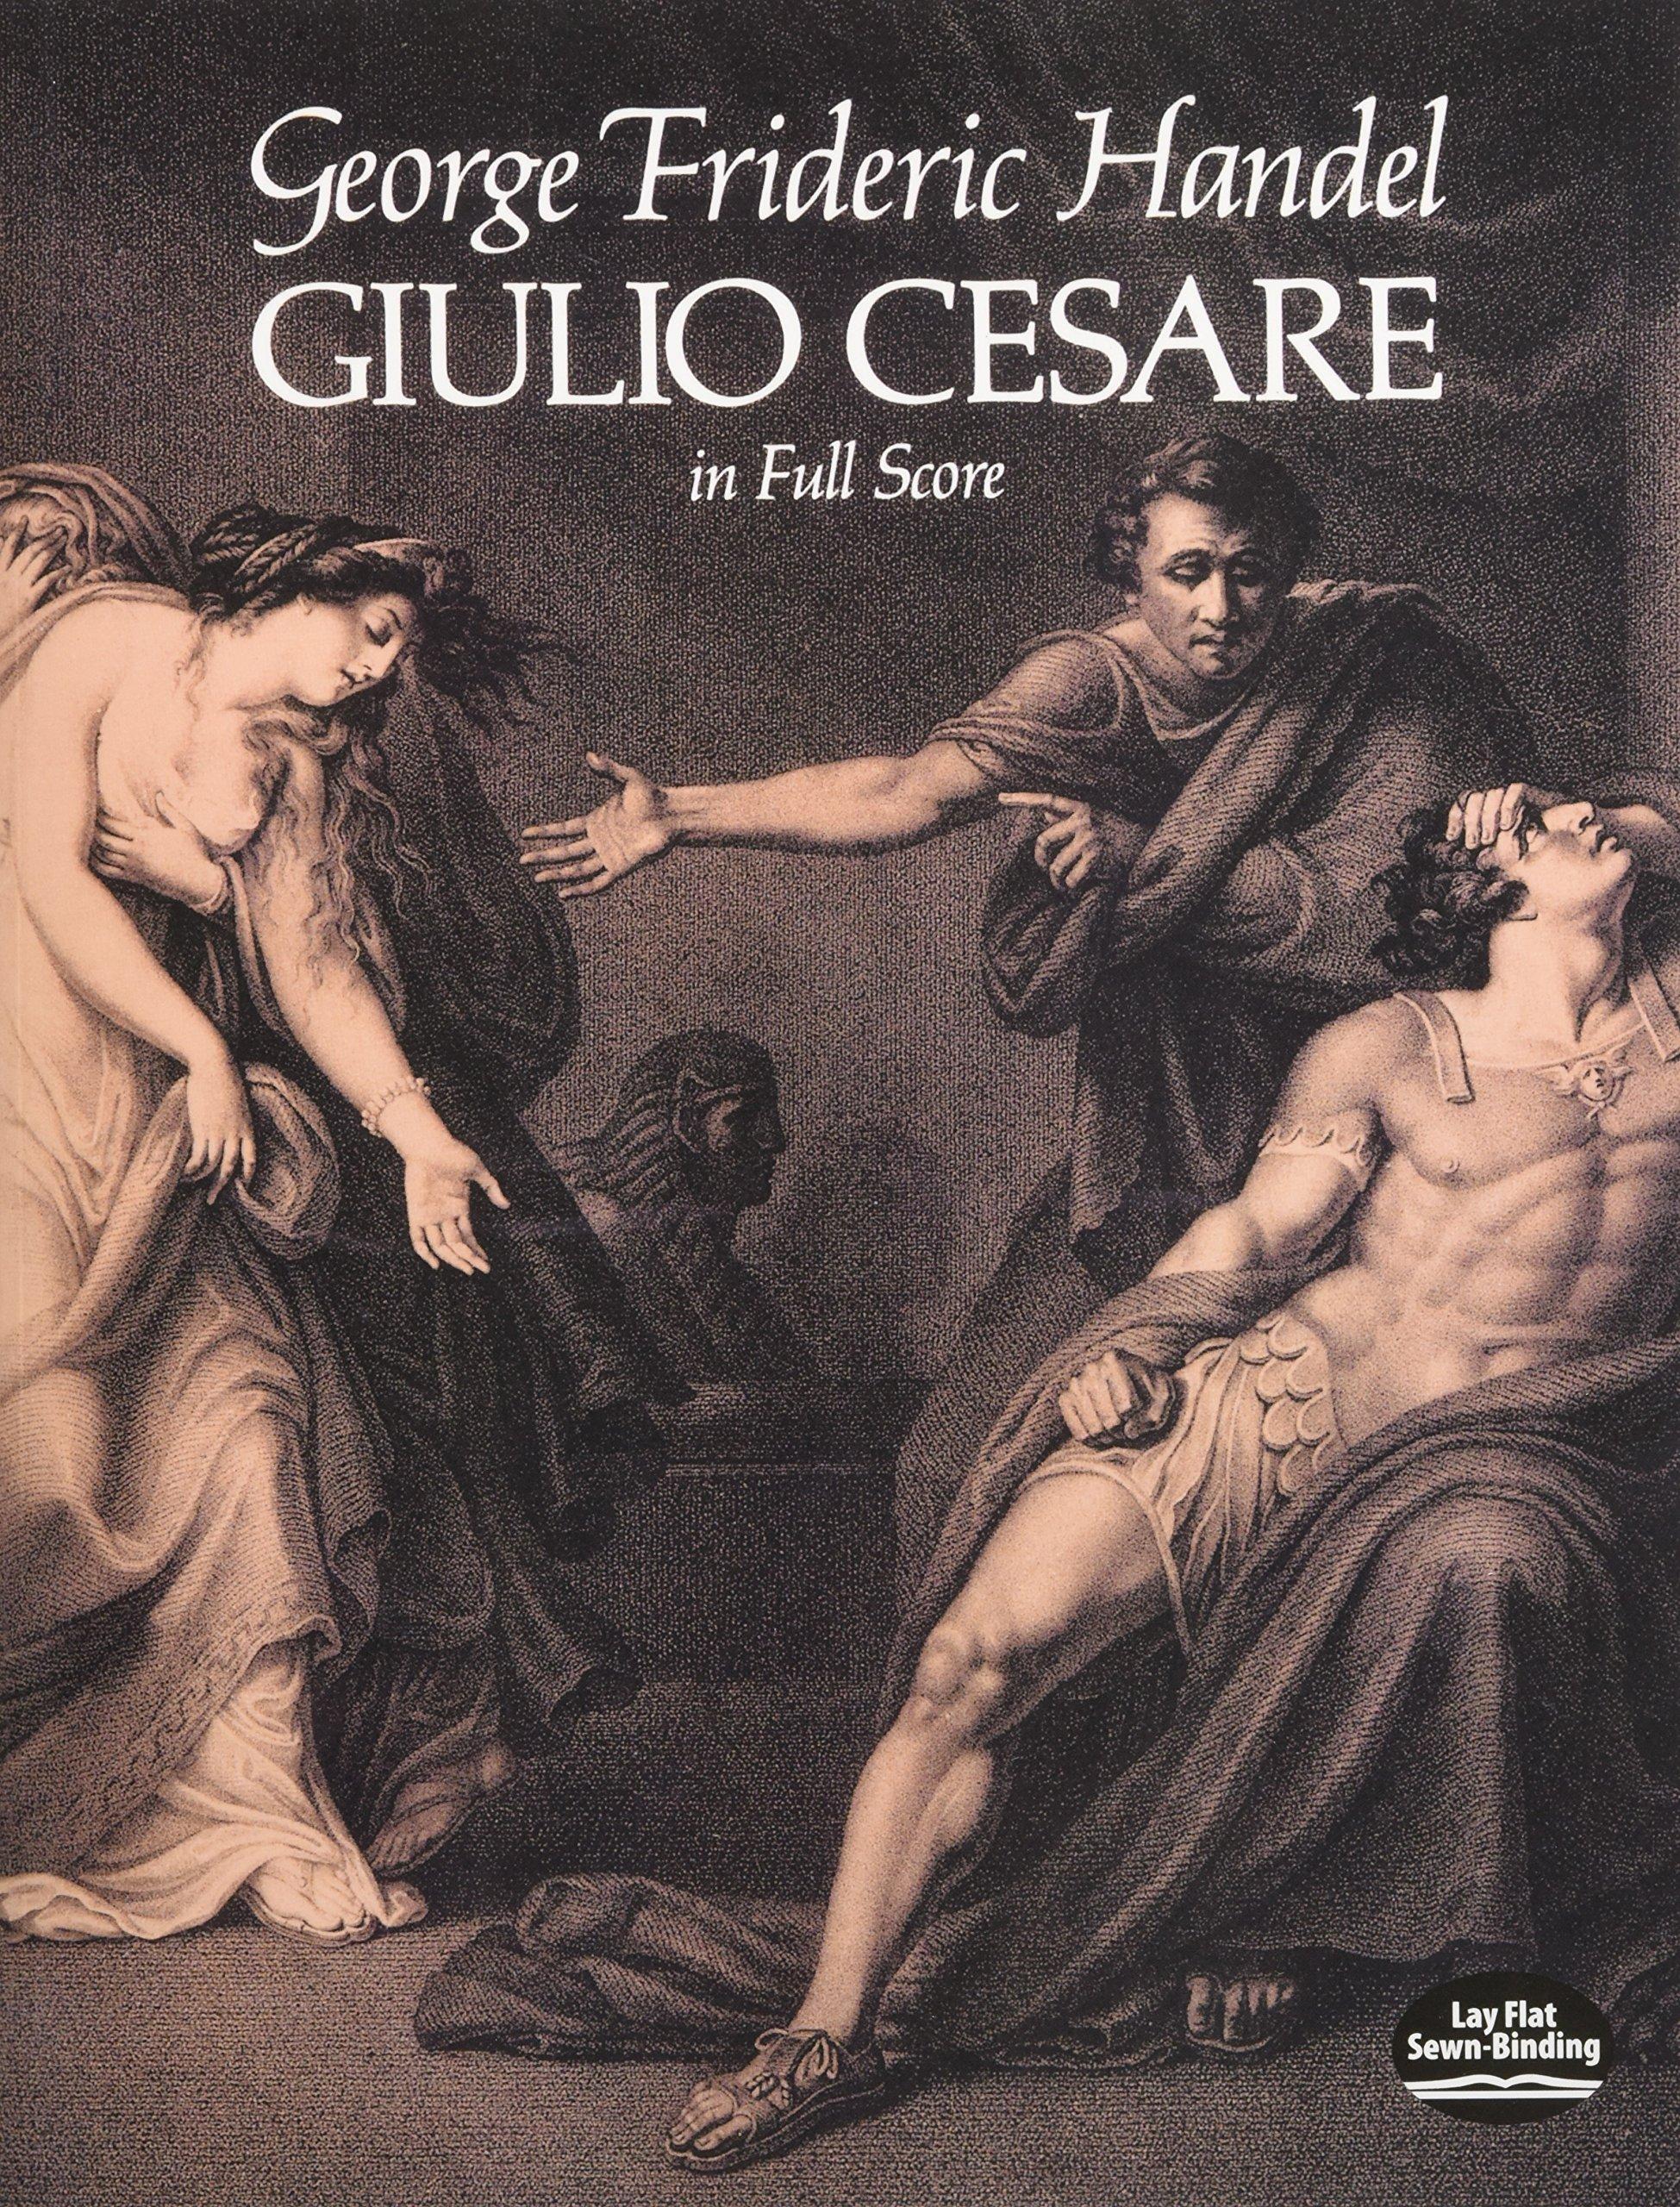 Giulio Cesare F/S -ALB- (Deutsche H? ndelgesellschaft edition.): Partitur, Dirigierpartitur (Dover Vocal Scores)